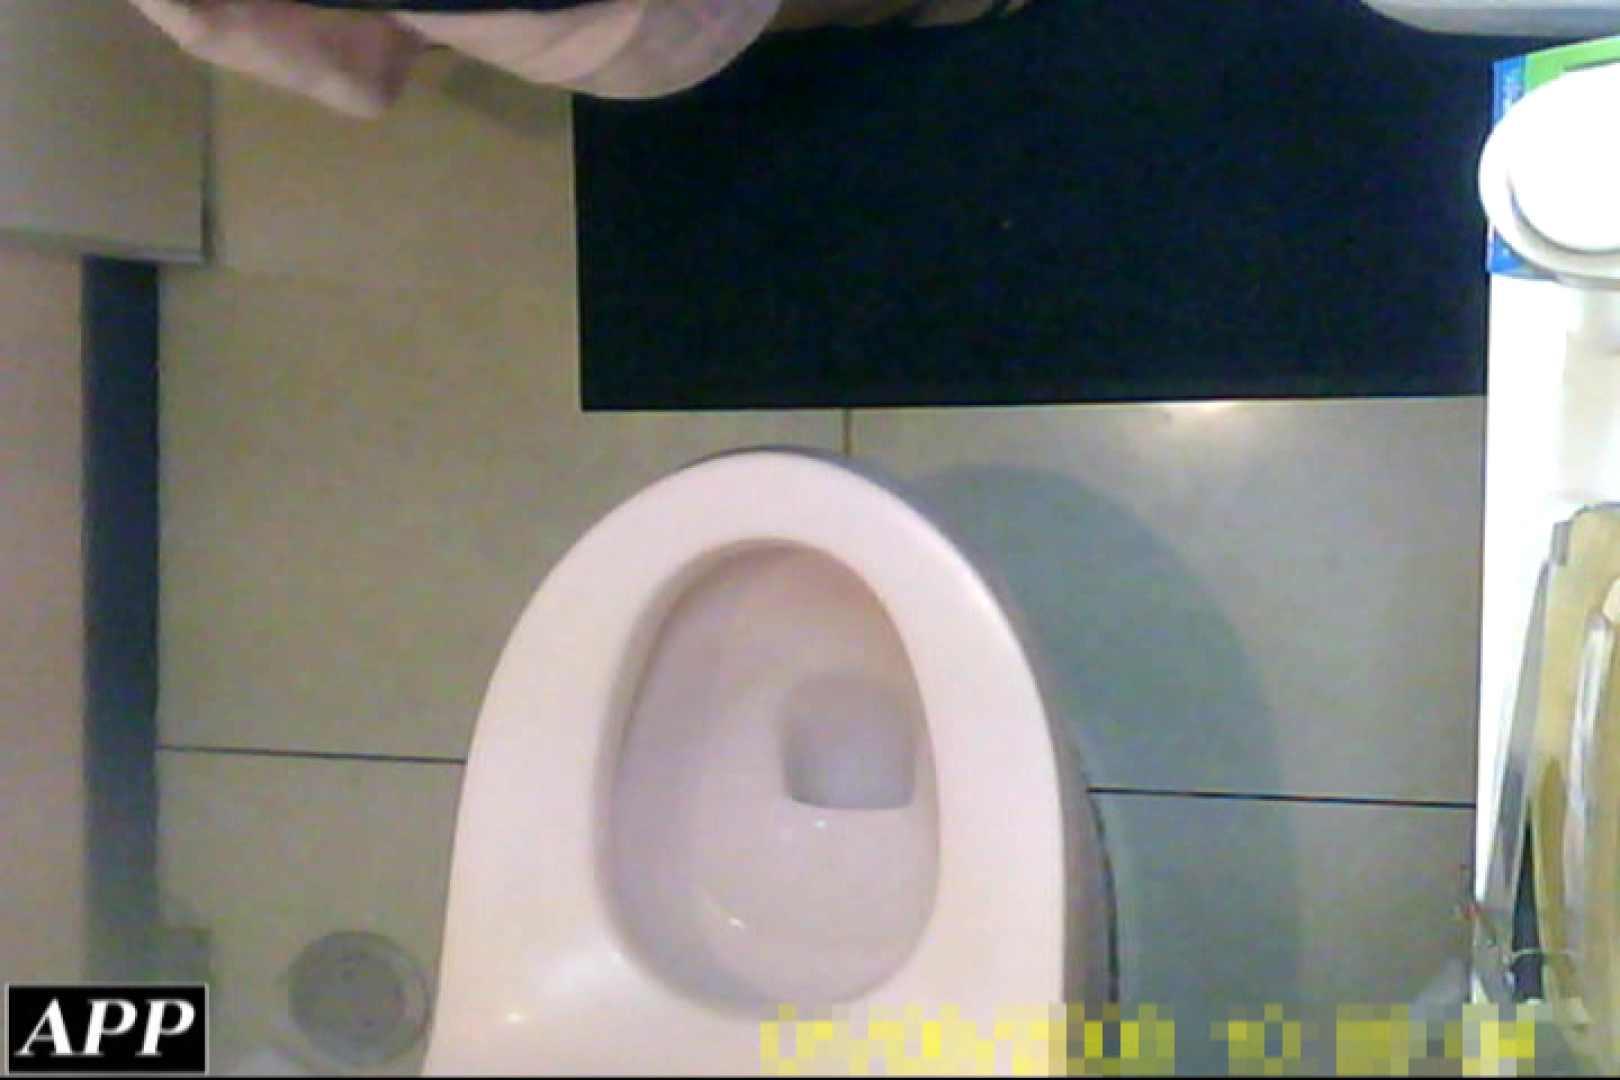 3視点洗面所 vol.21 マンコ 性交動画流出 83画像 55